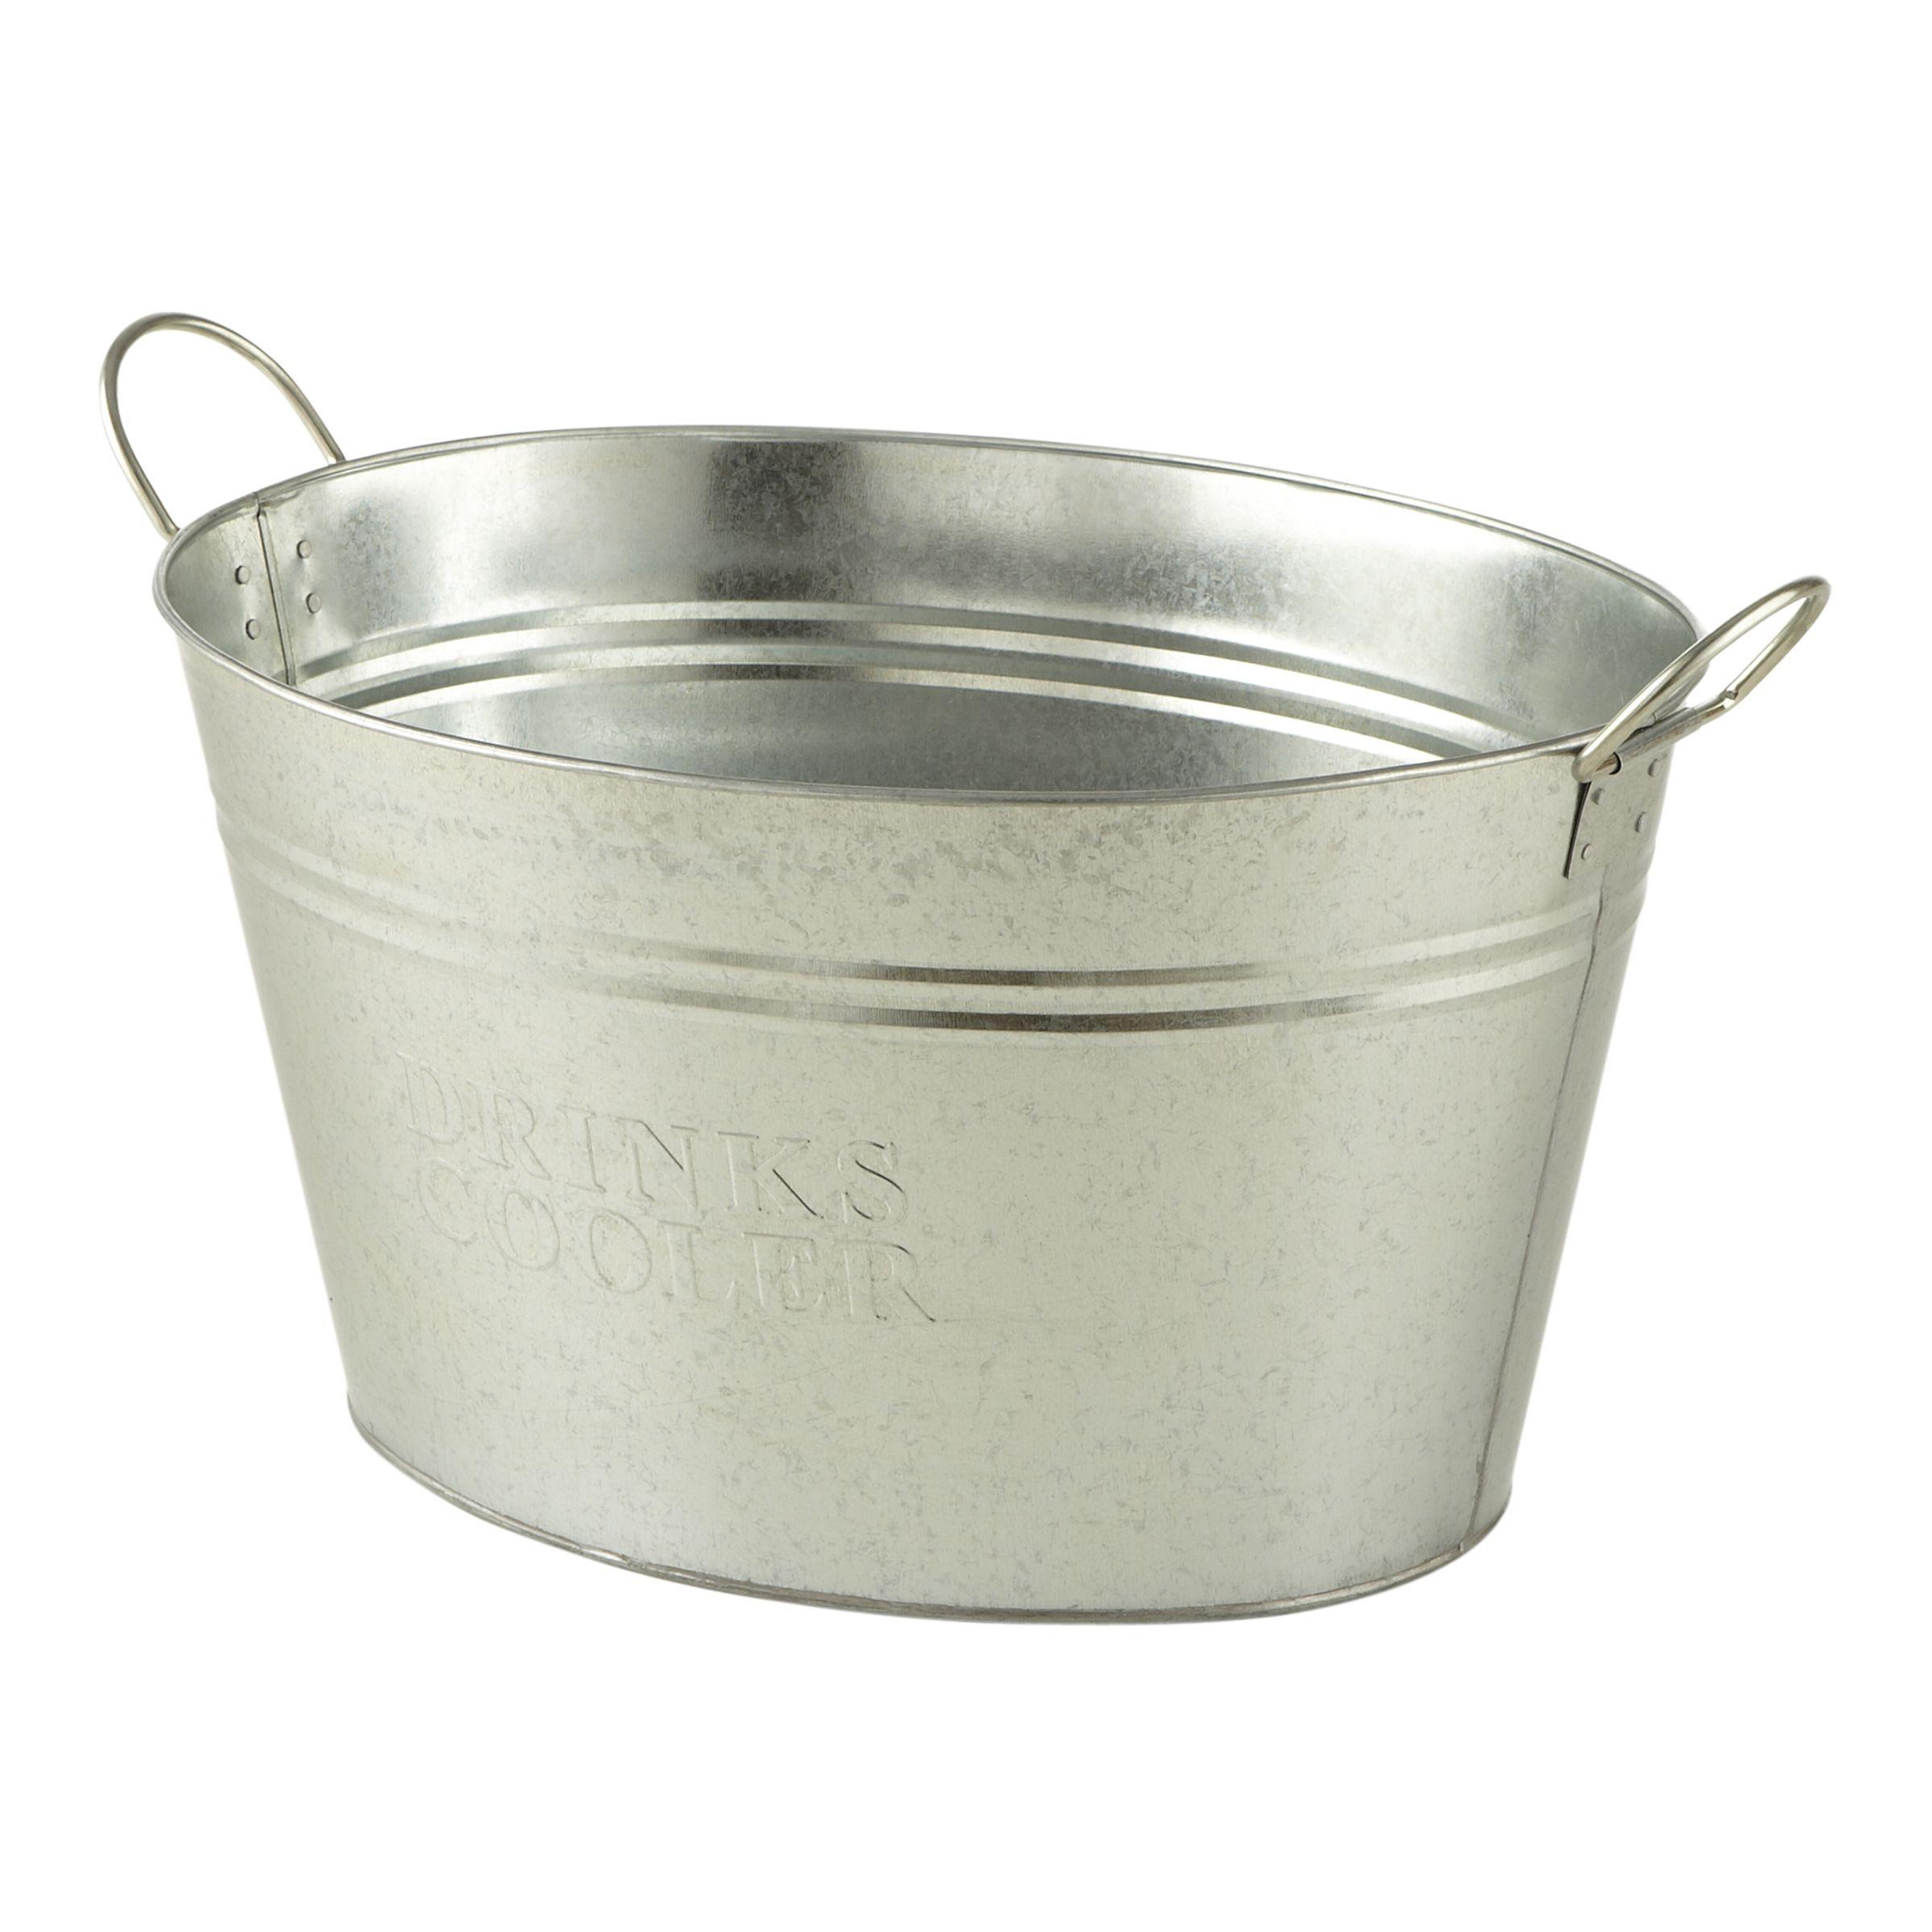 Hot Tub Drink Carrier